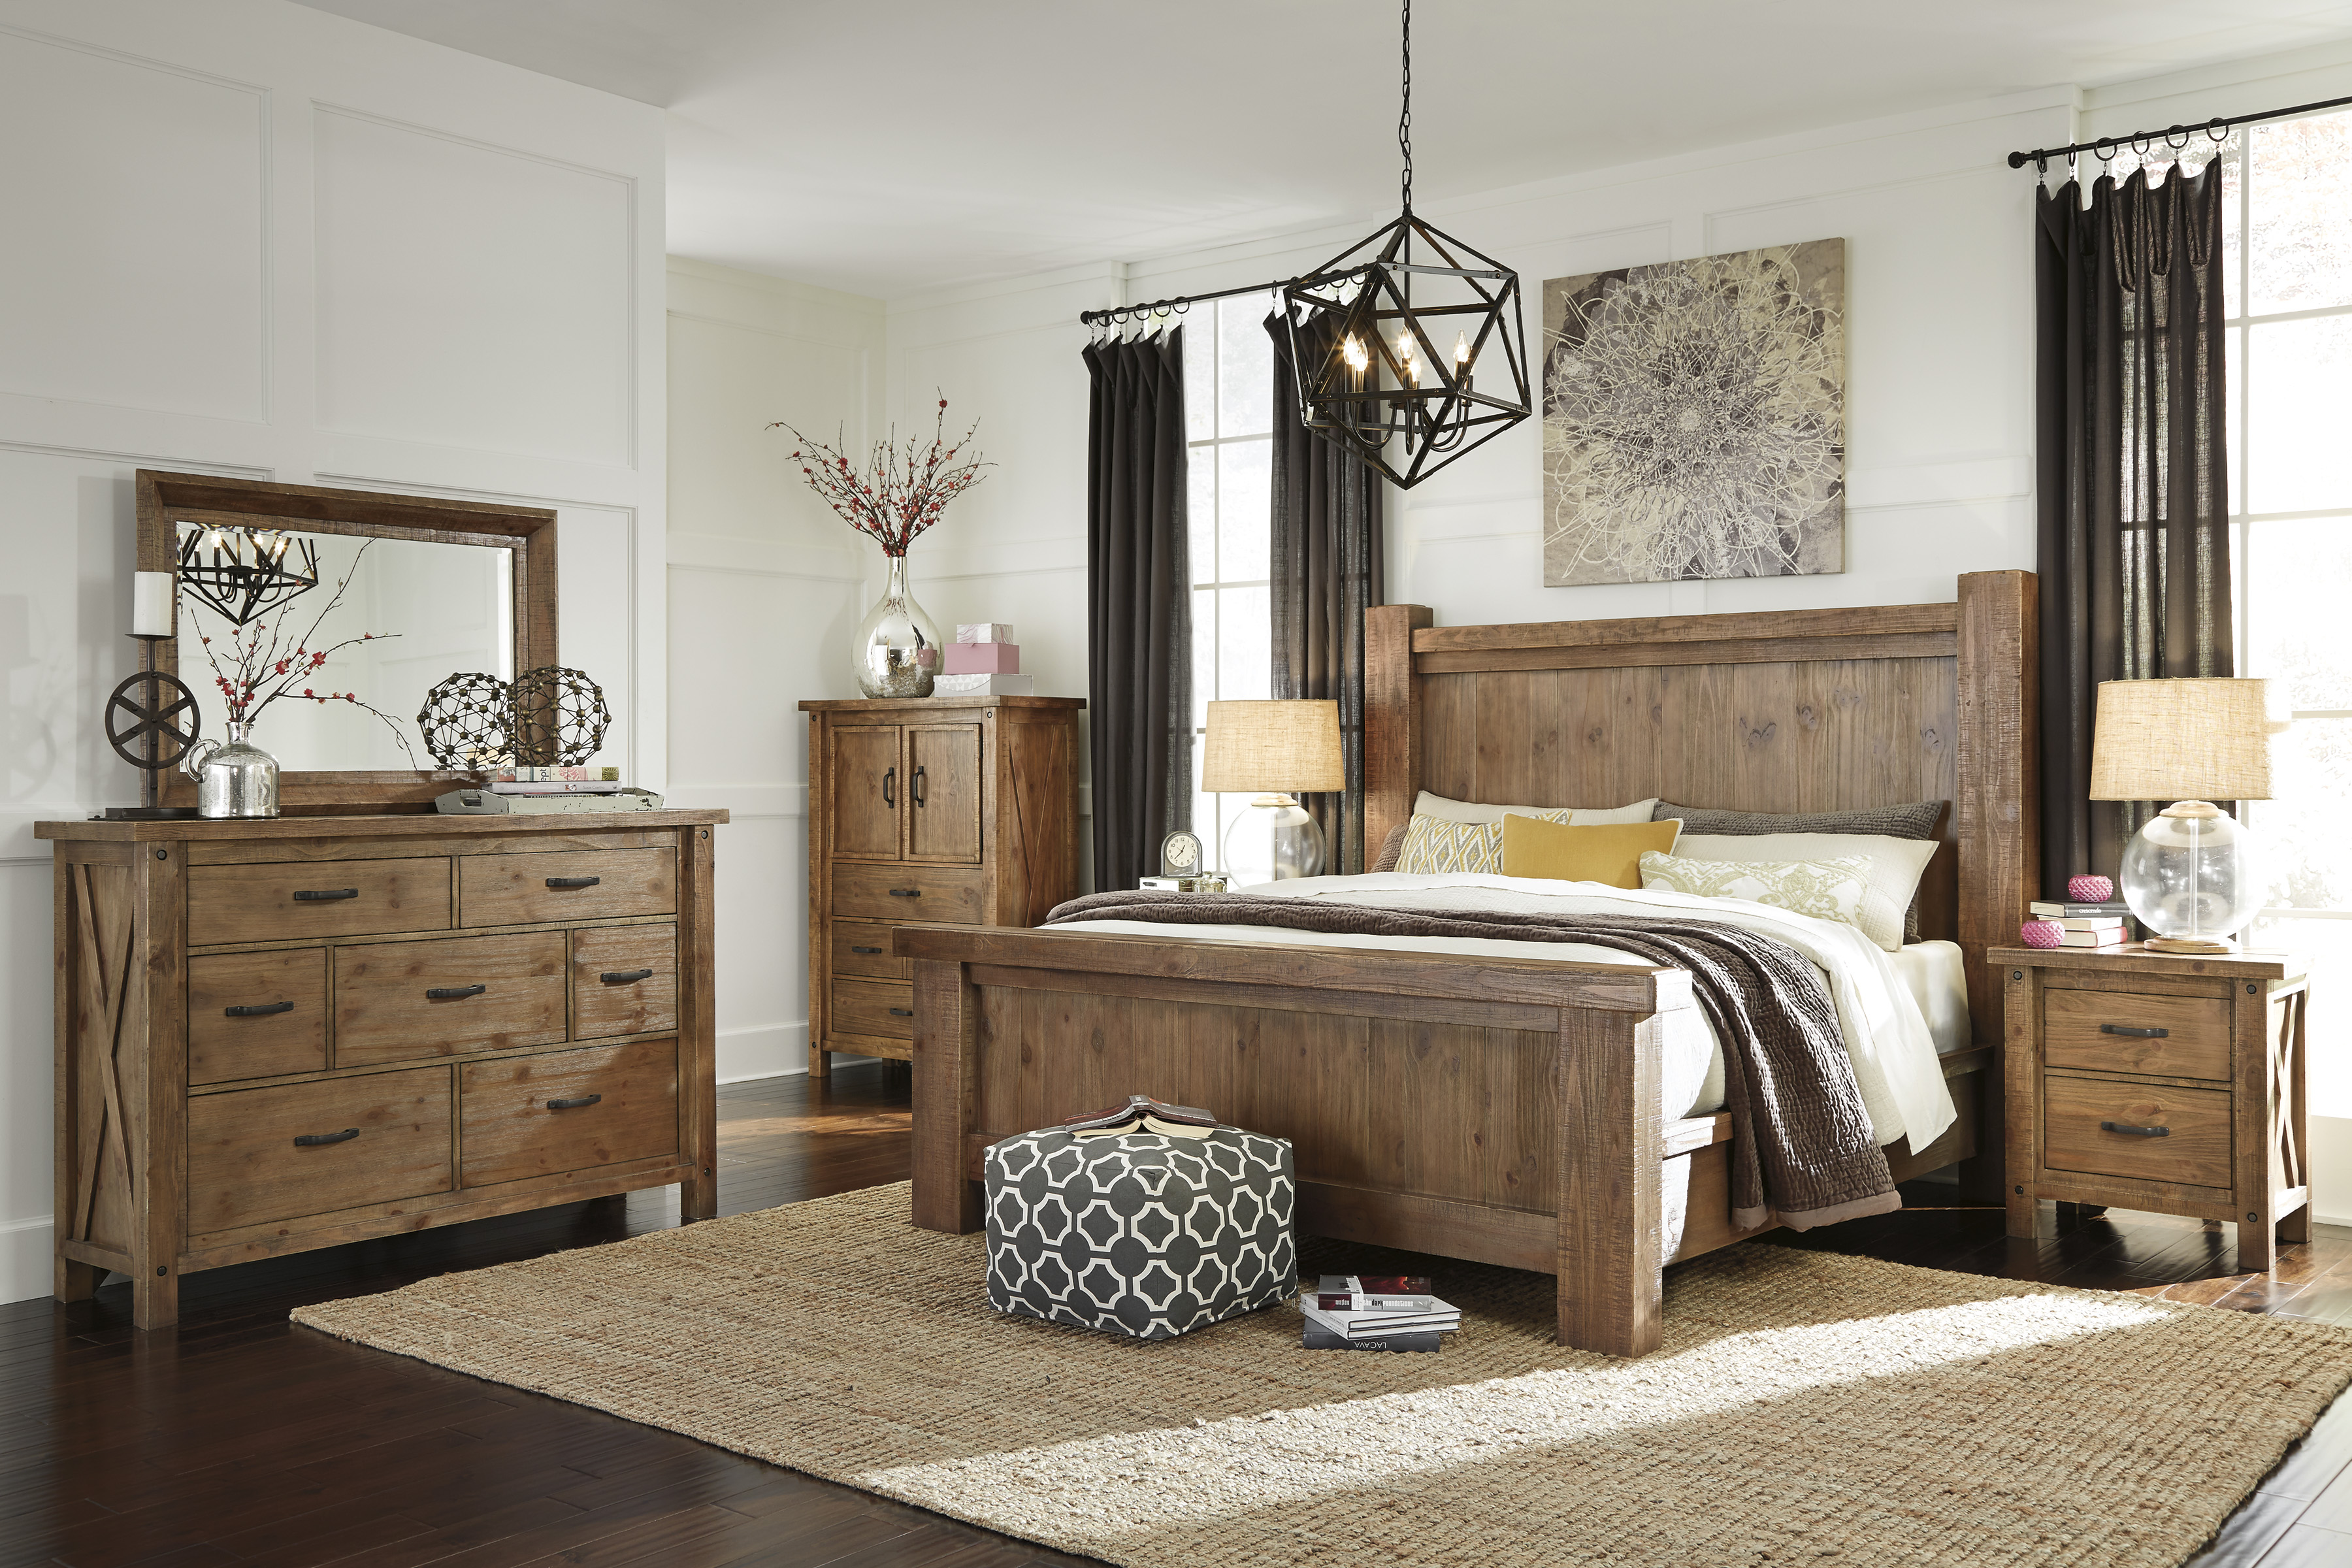 M S Bedroom Furniture Divano Furniture Ridgeland Jackson Madison Ms